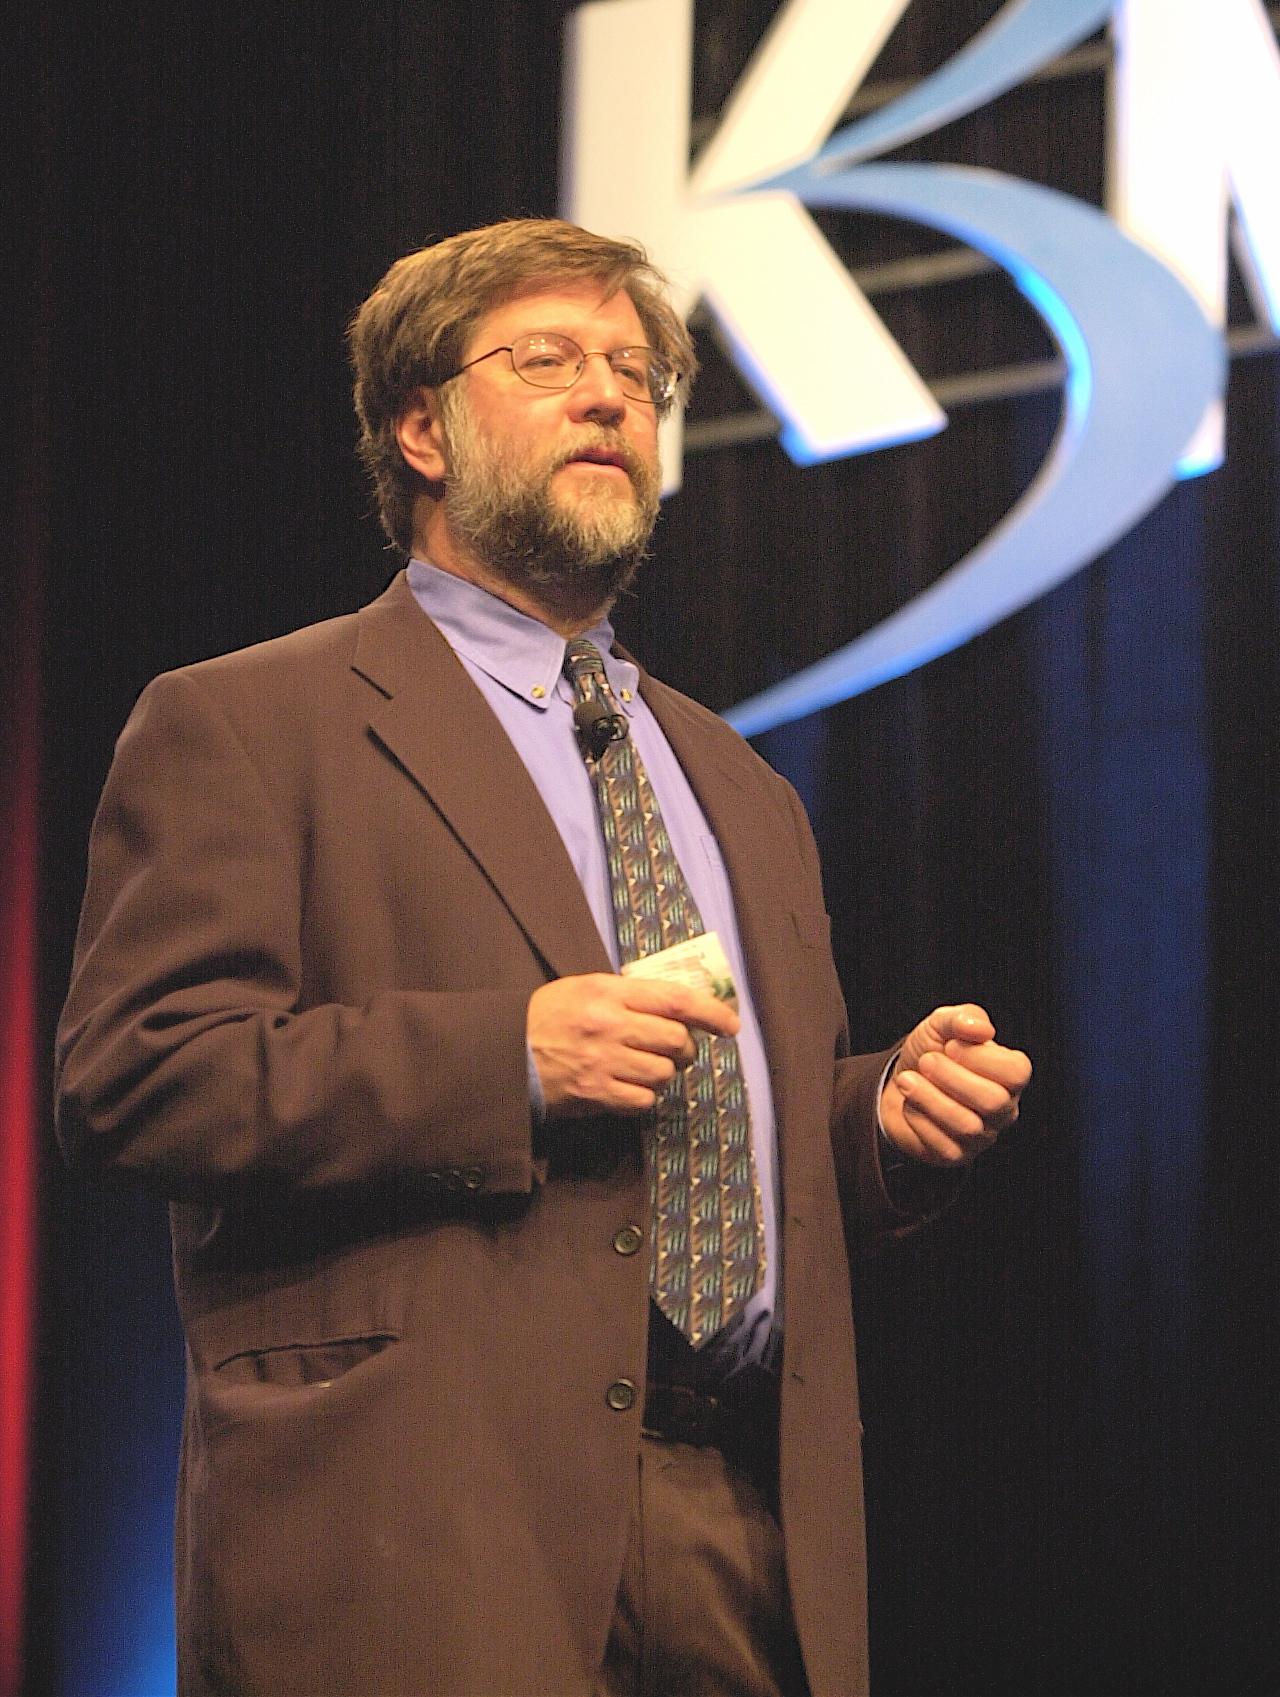 http://en.wikipedia.org/wiki/Craig_Cline